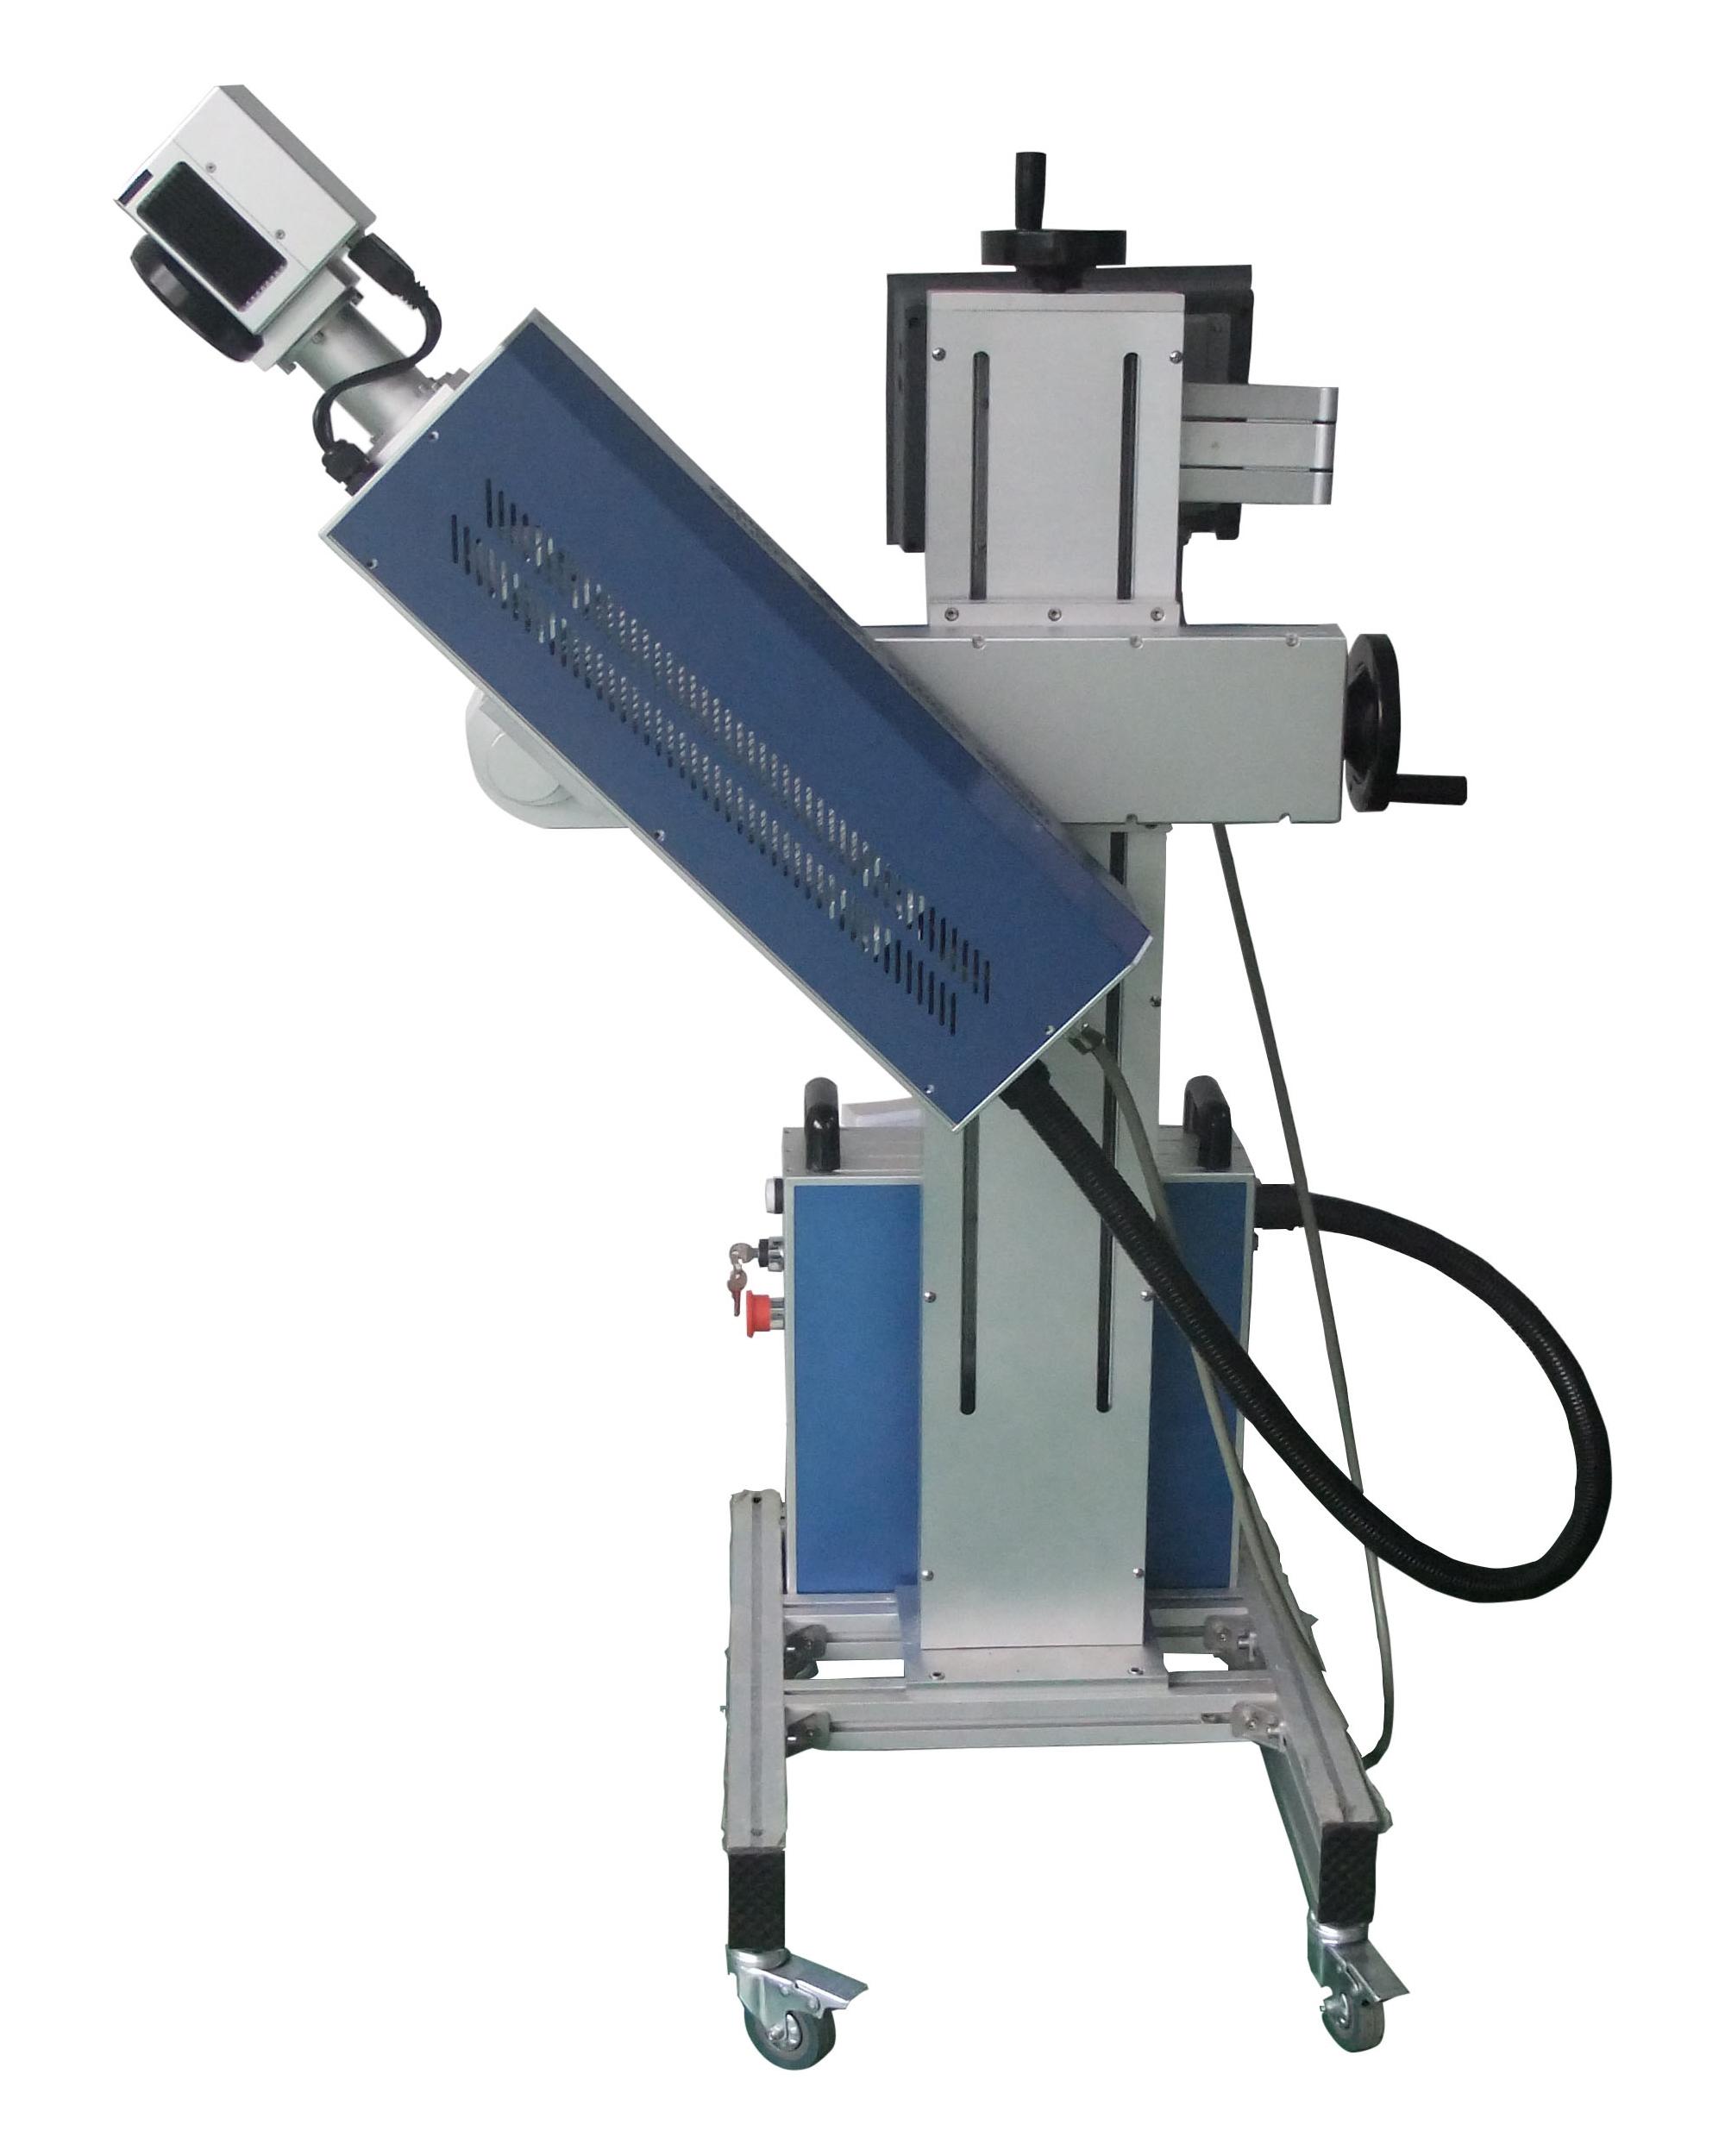 PET bottle laser printer